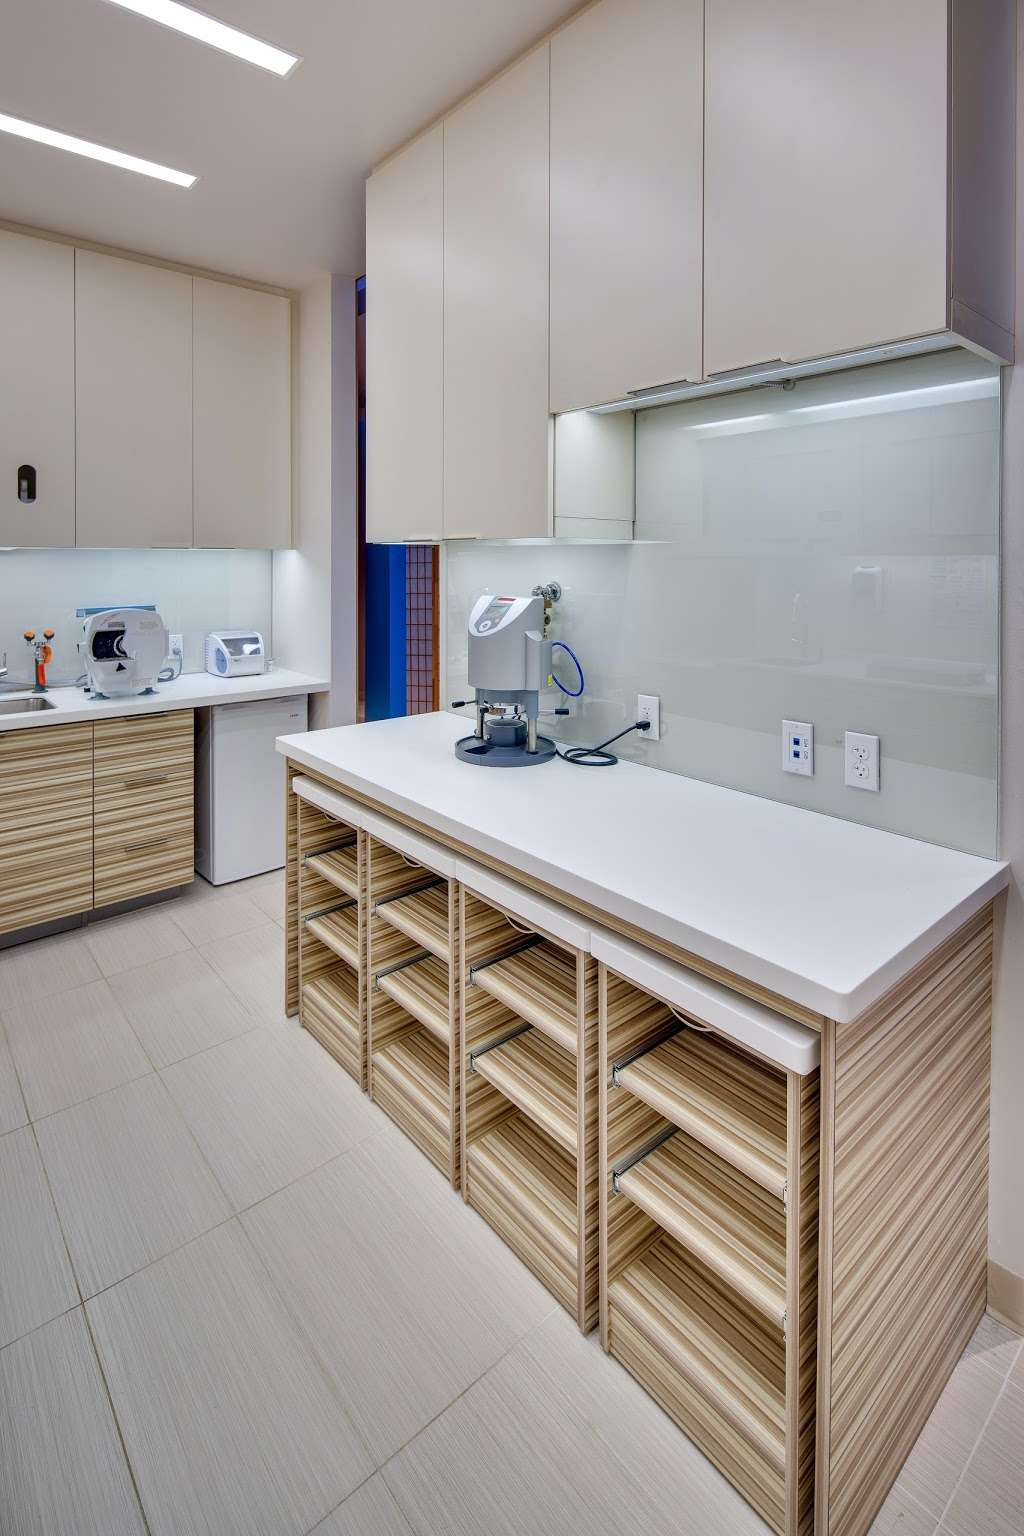 Encore Dental - dentist  | Photo 10 of 10 | Address: 6040 Main St, American Canyon, CA 94503, USA | Phone: (707) 562-4090